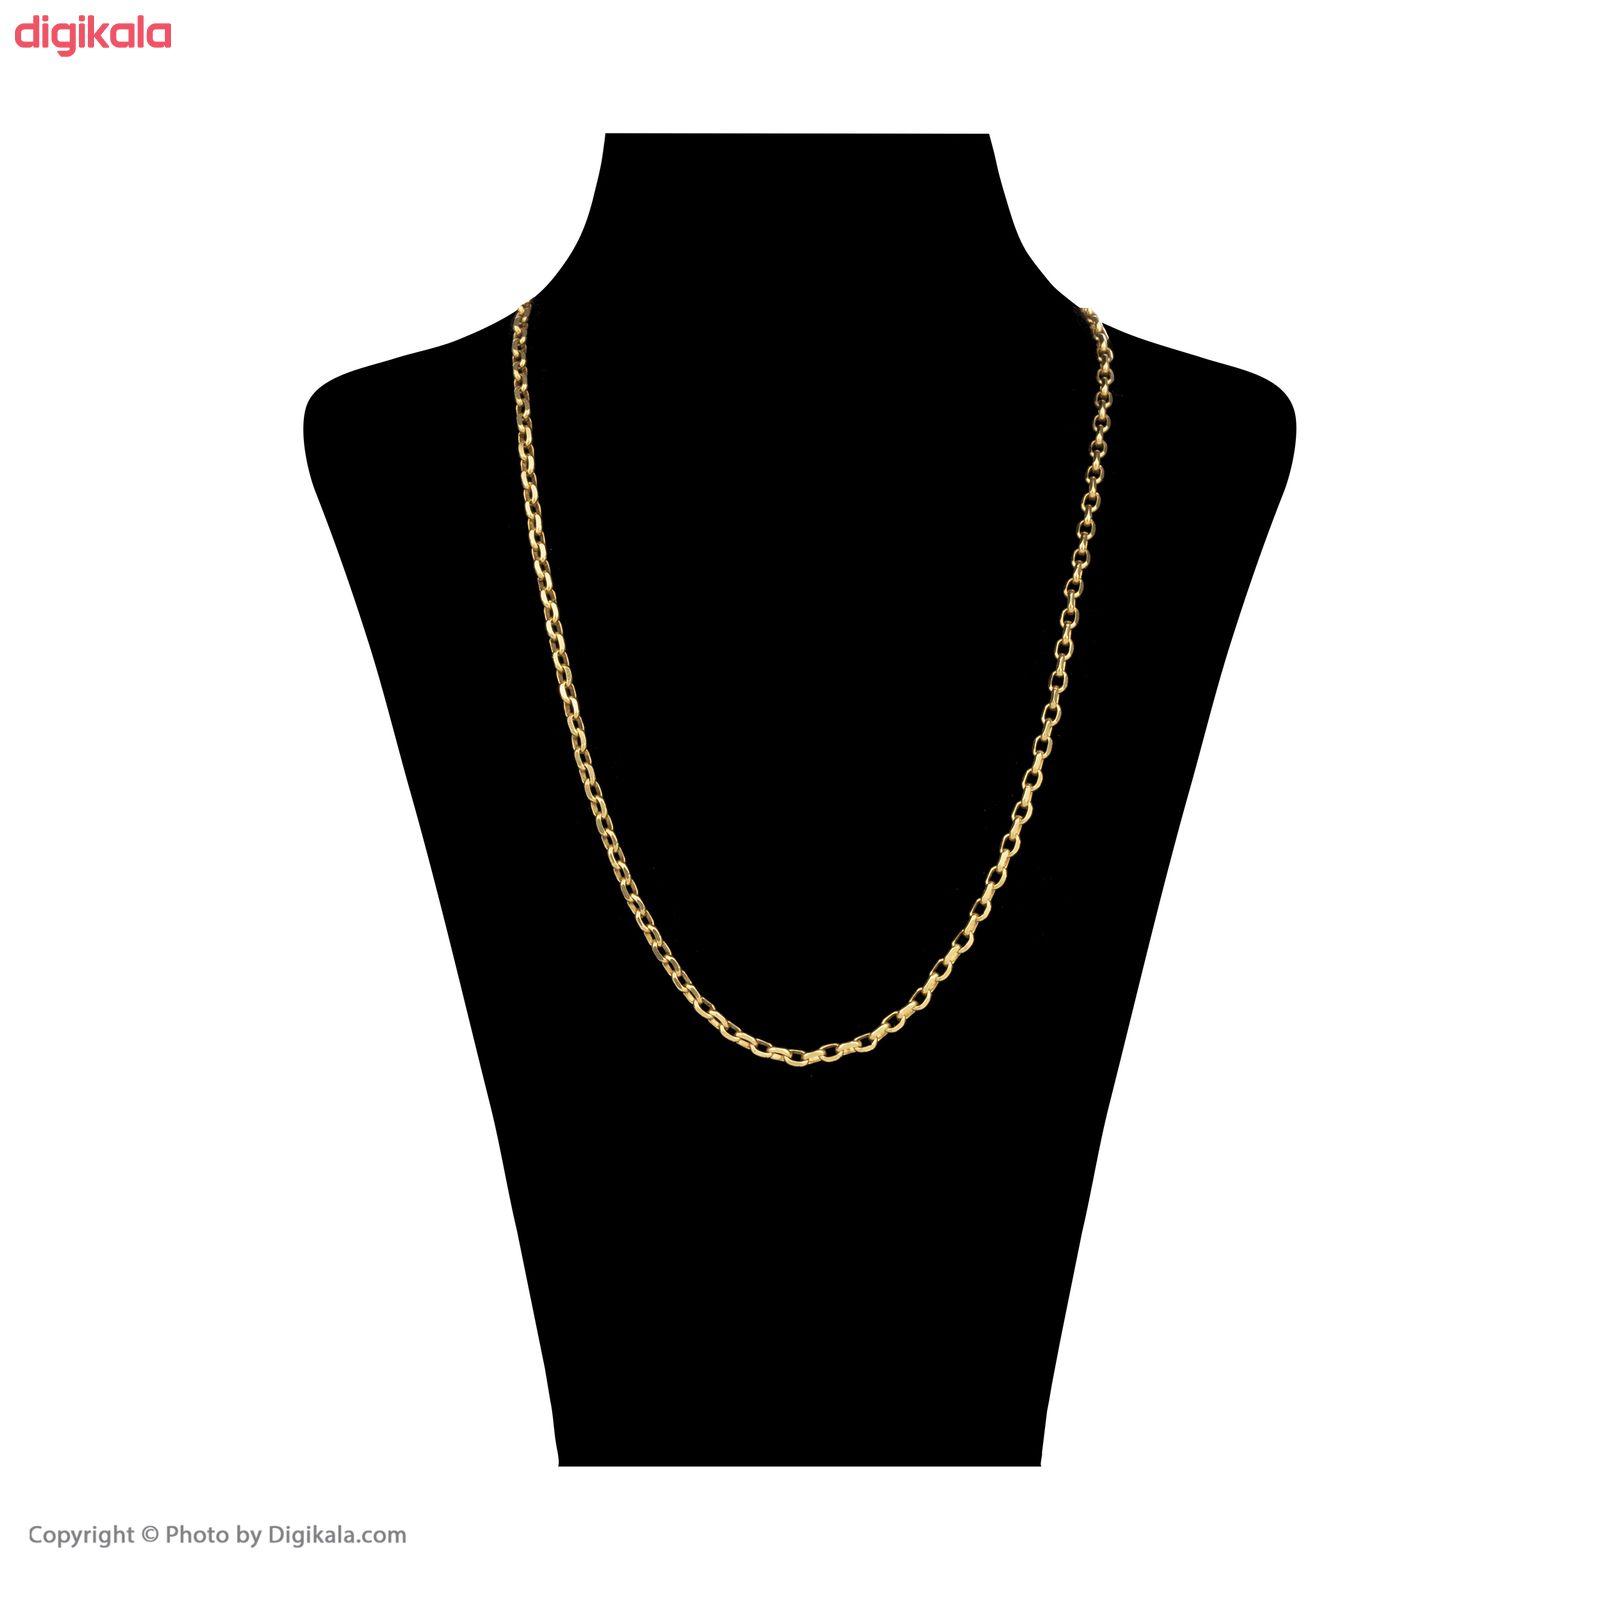 زنجیر طلا 18 عیار زنانه آلند کد TZ28 main 1 2